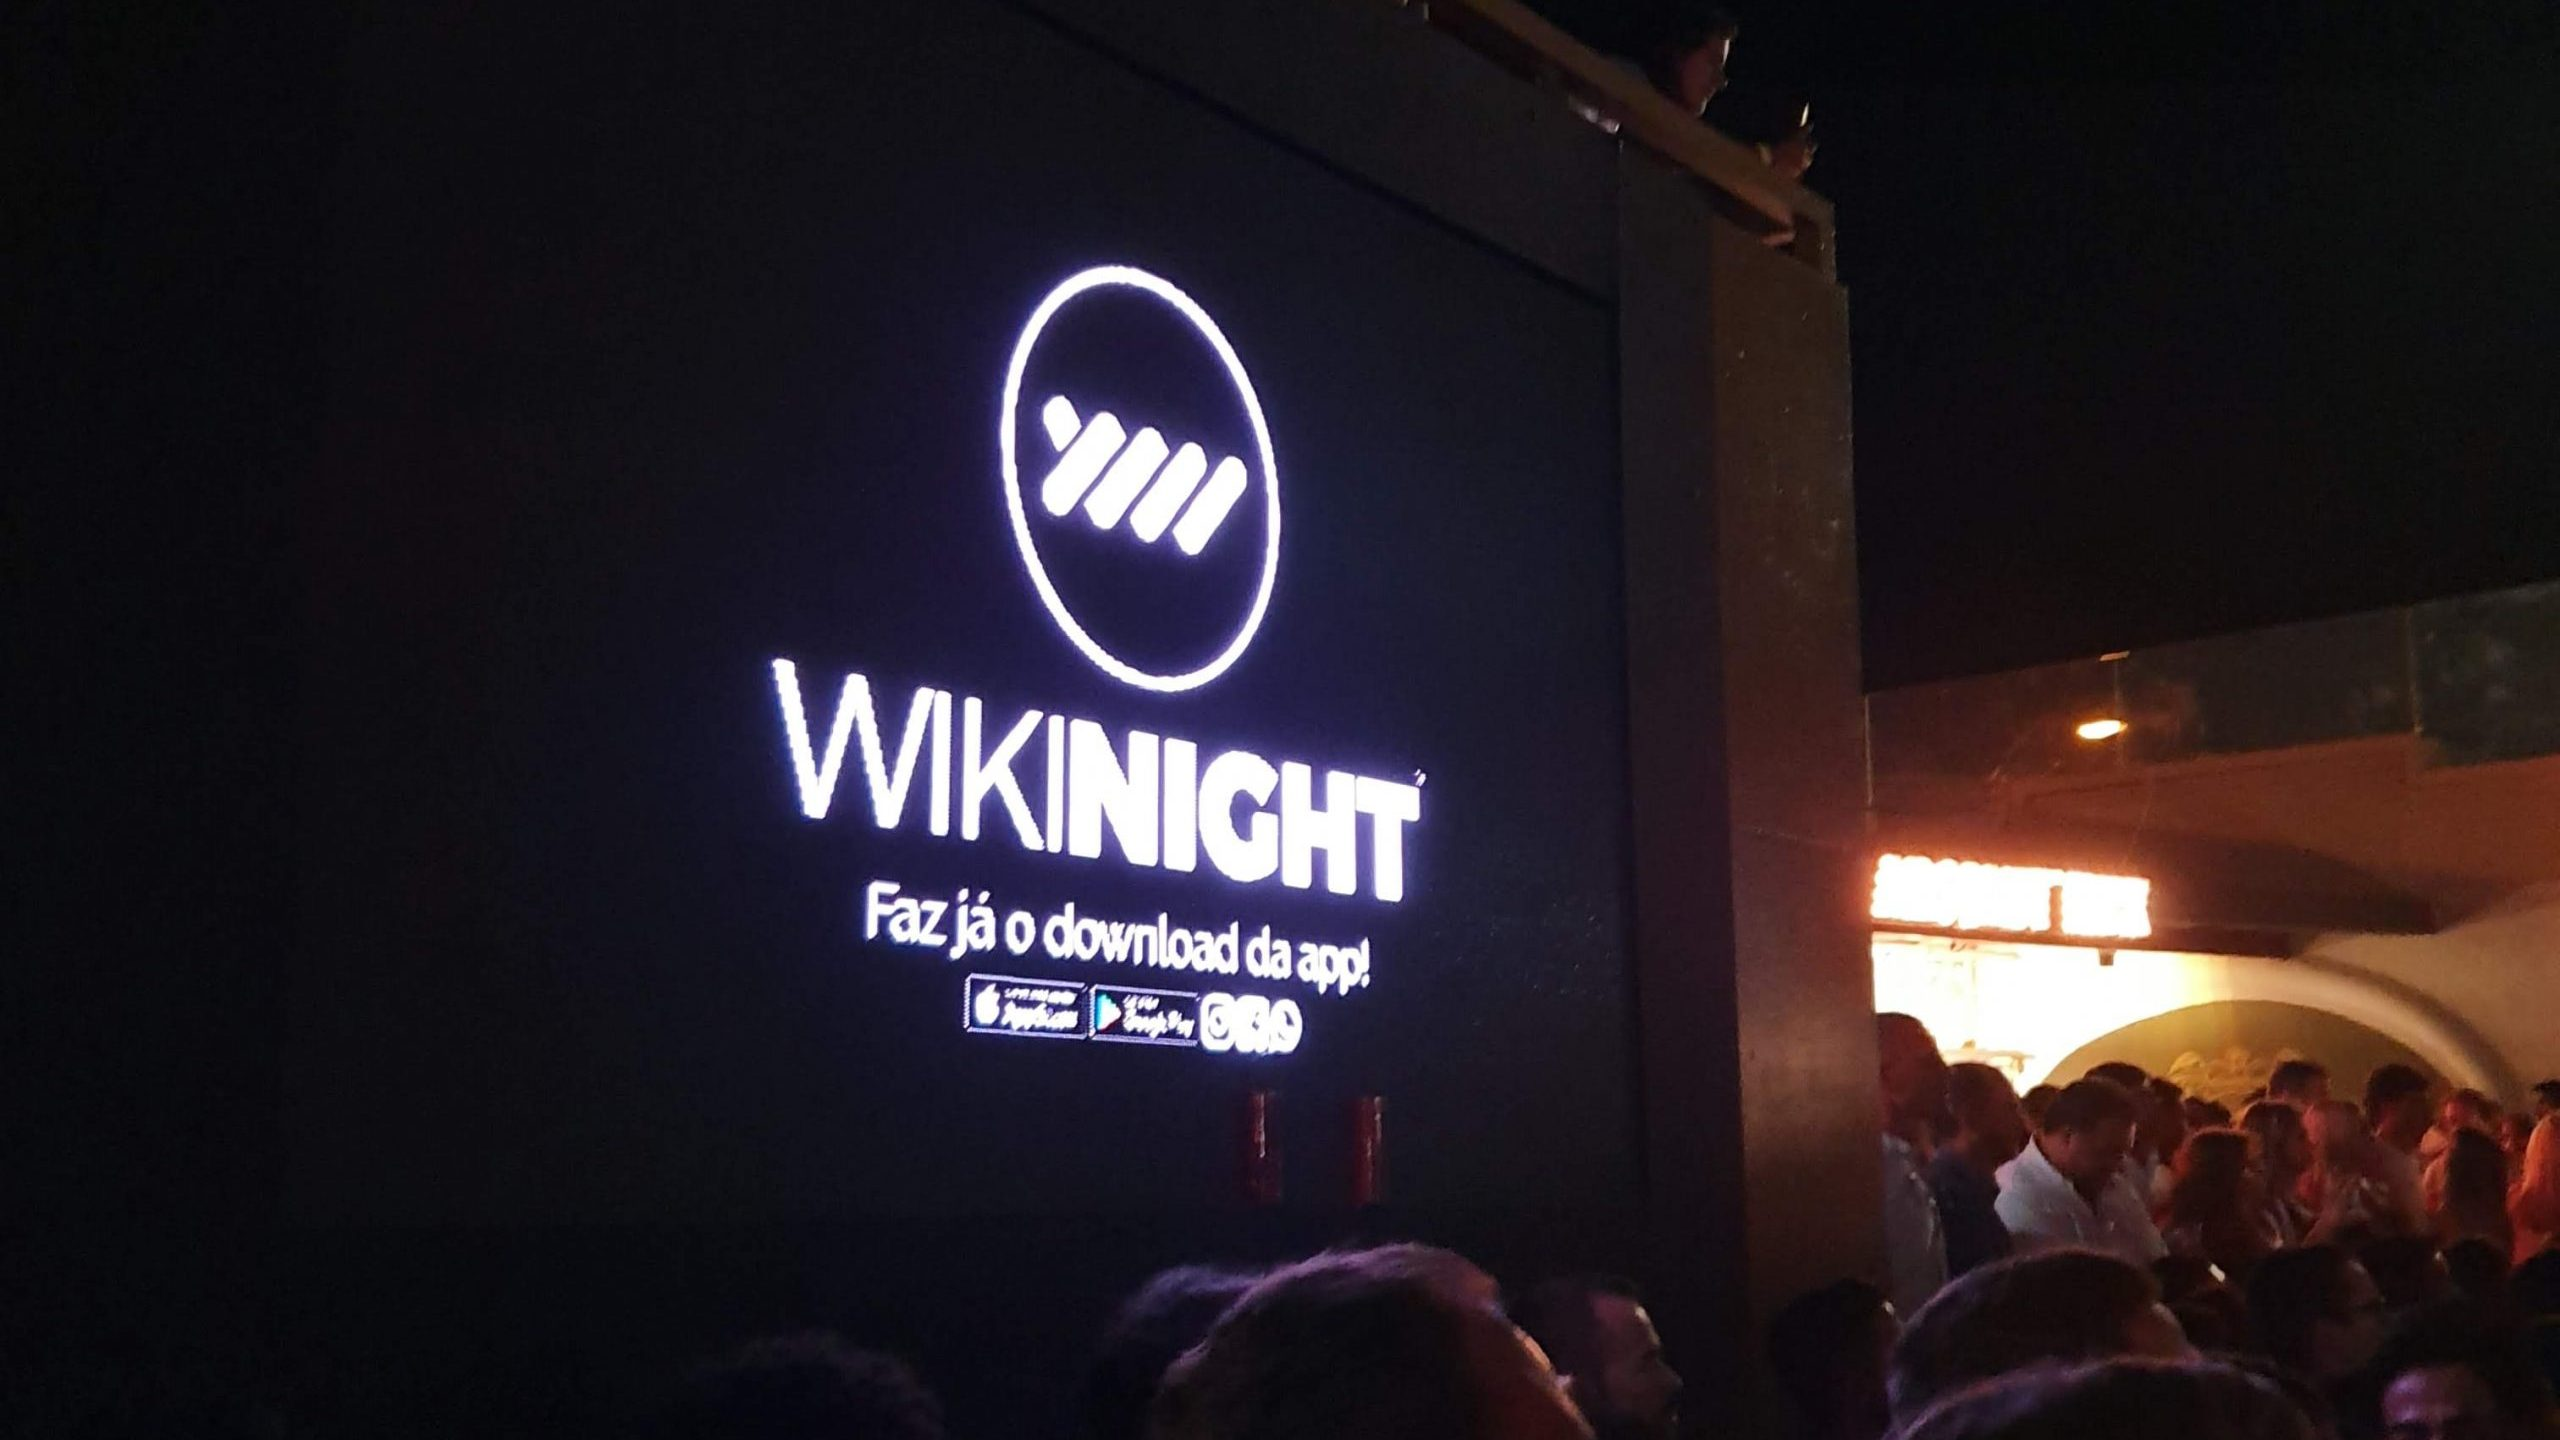 wikinight qr code